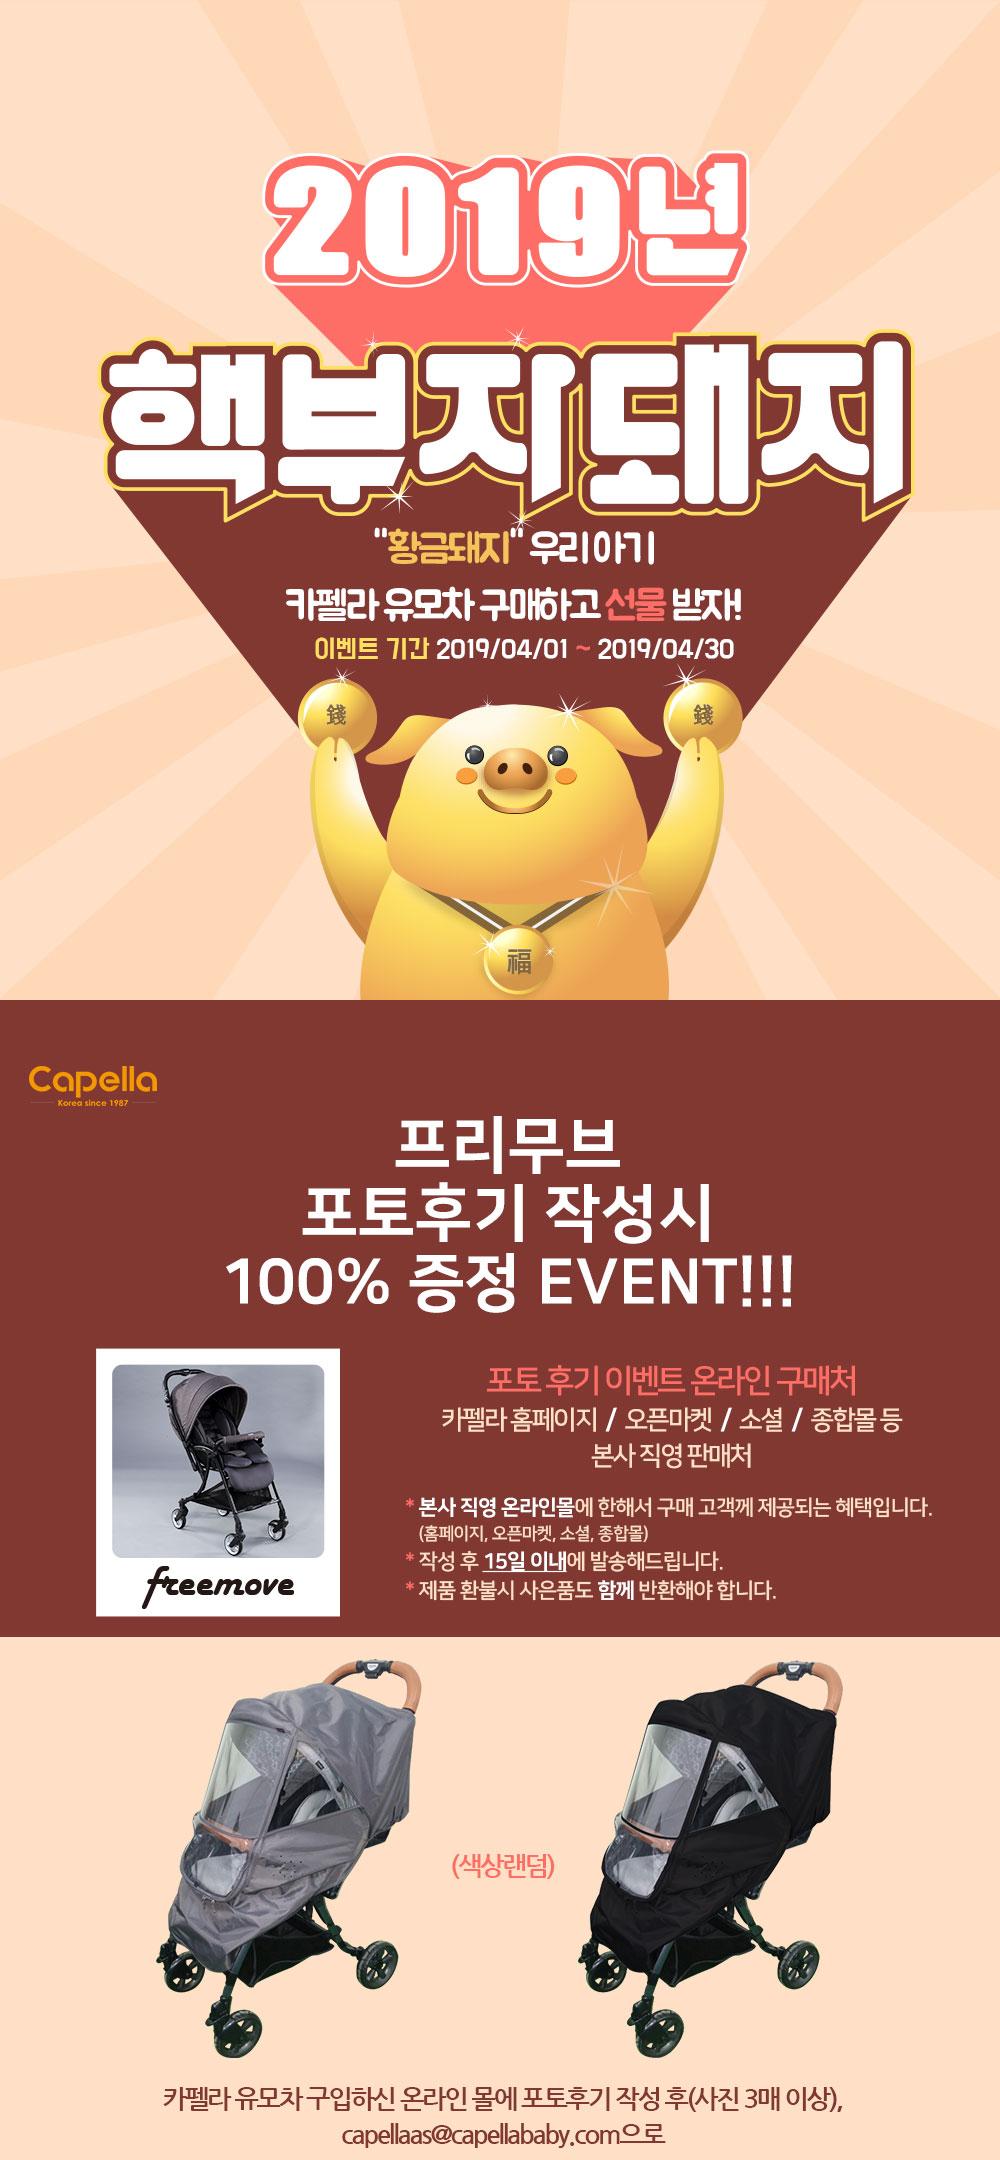 event_freemove.jpg